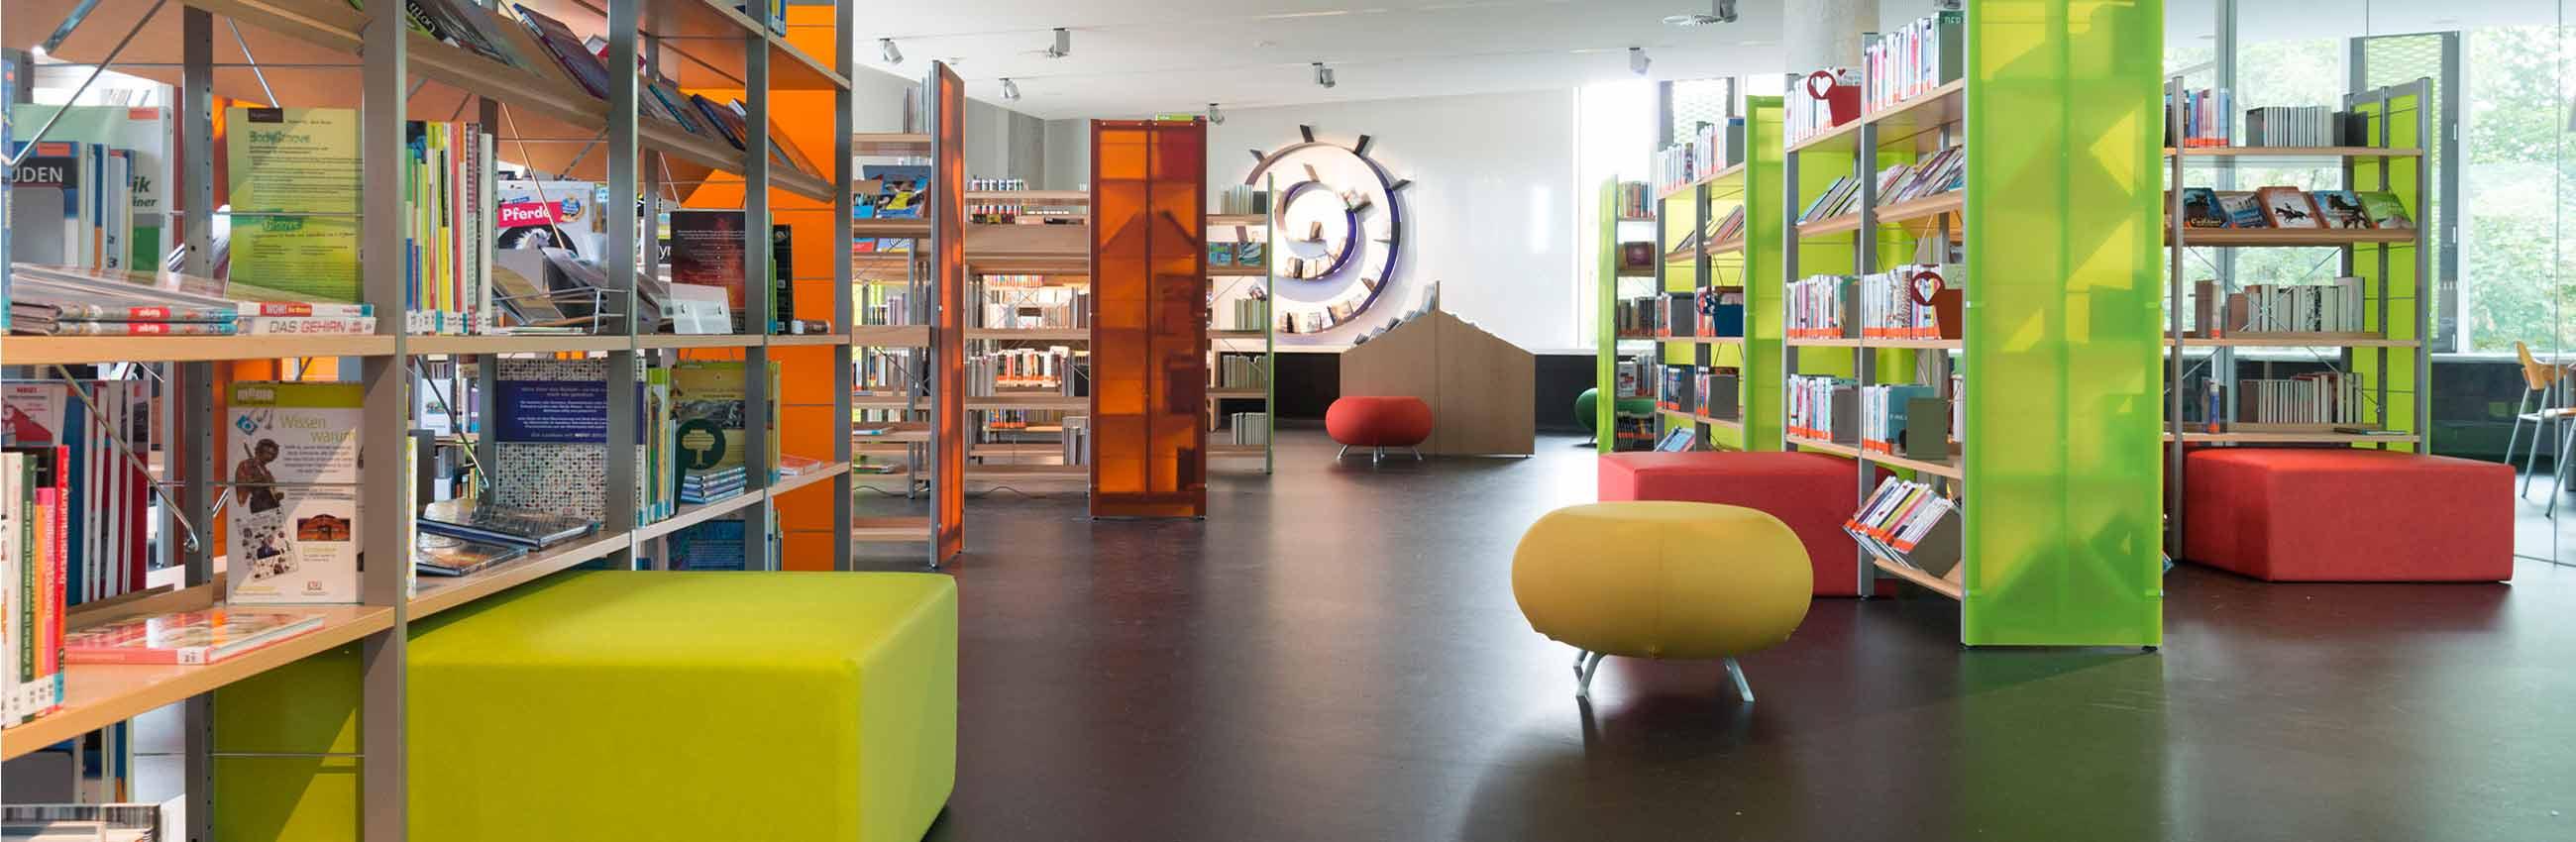 EKZ Bibliothekenausstattung